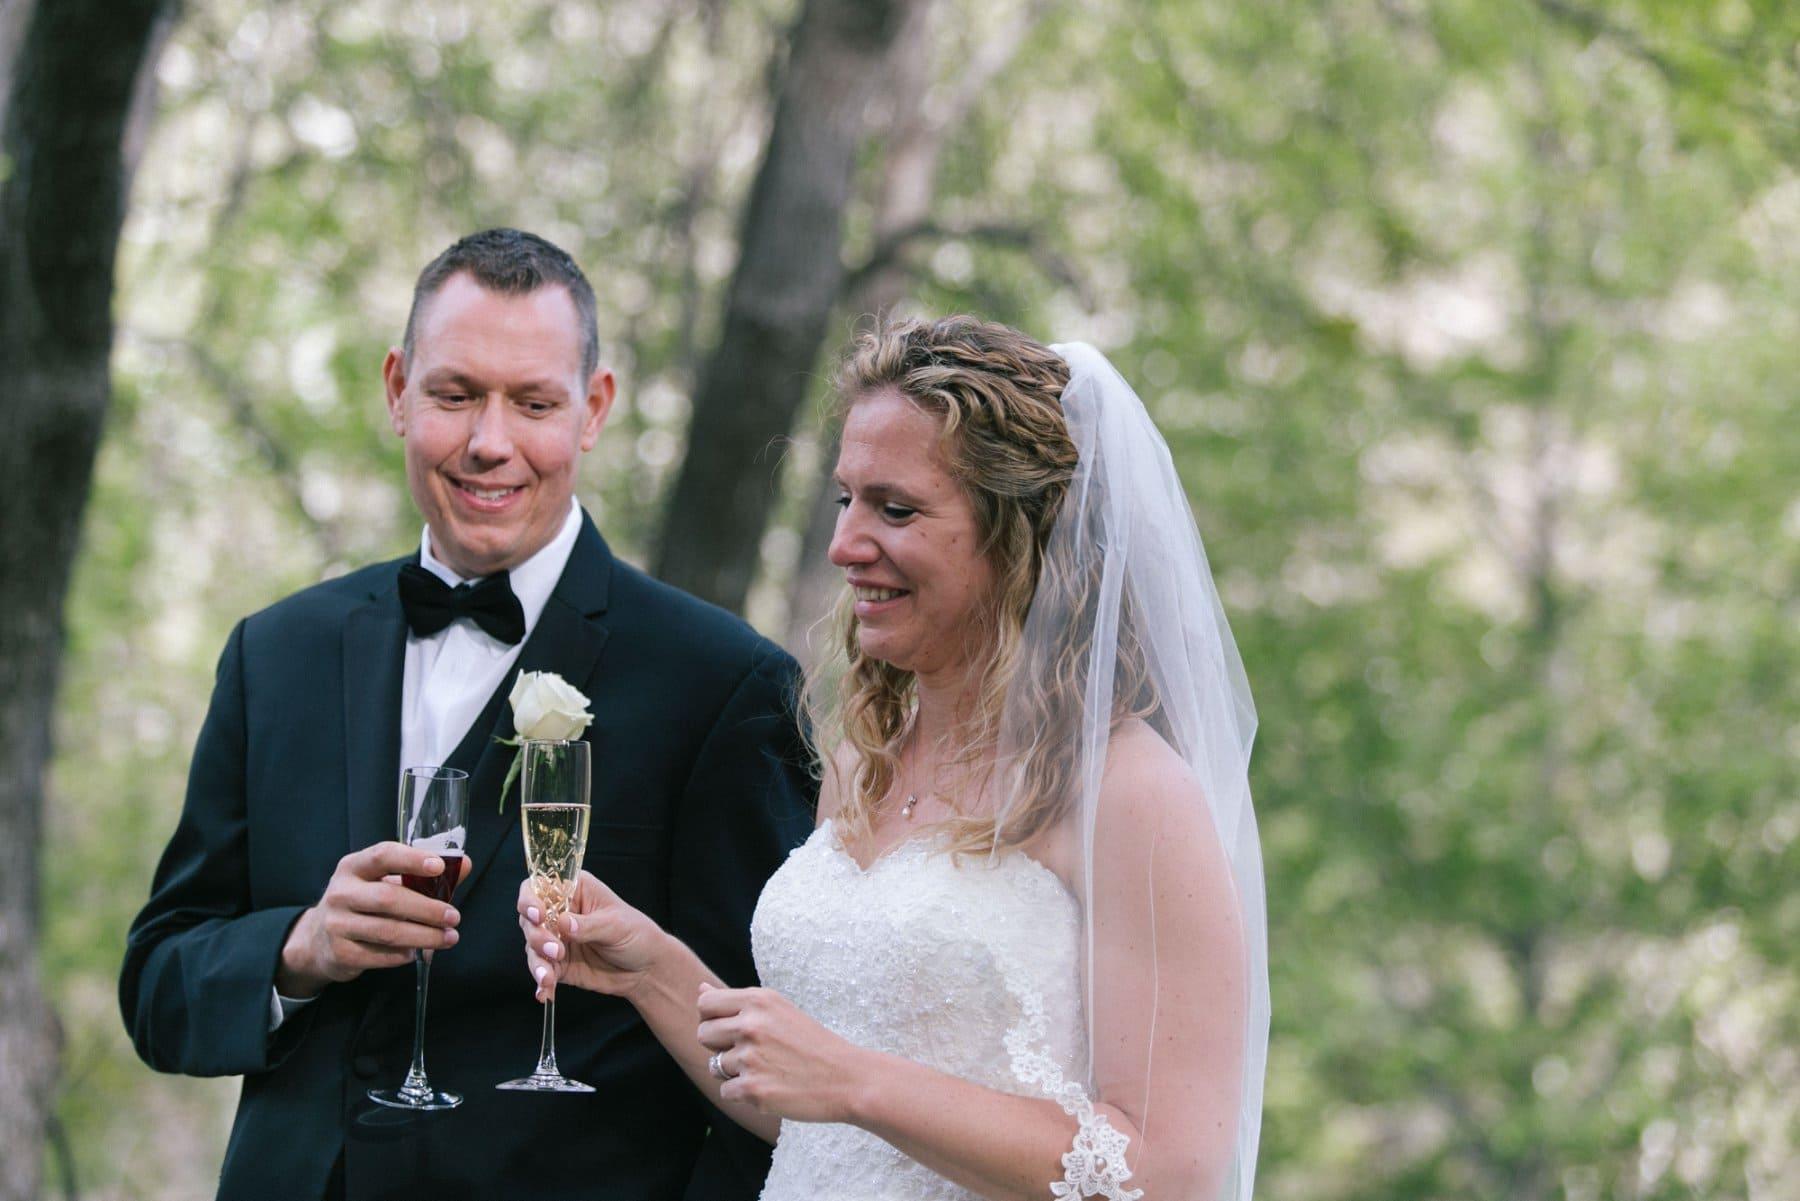 Briar Patch Inn bride & groom toasting